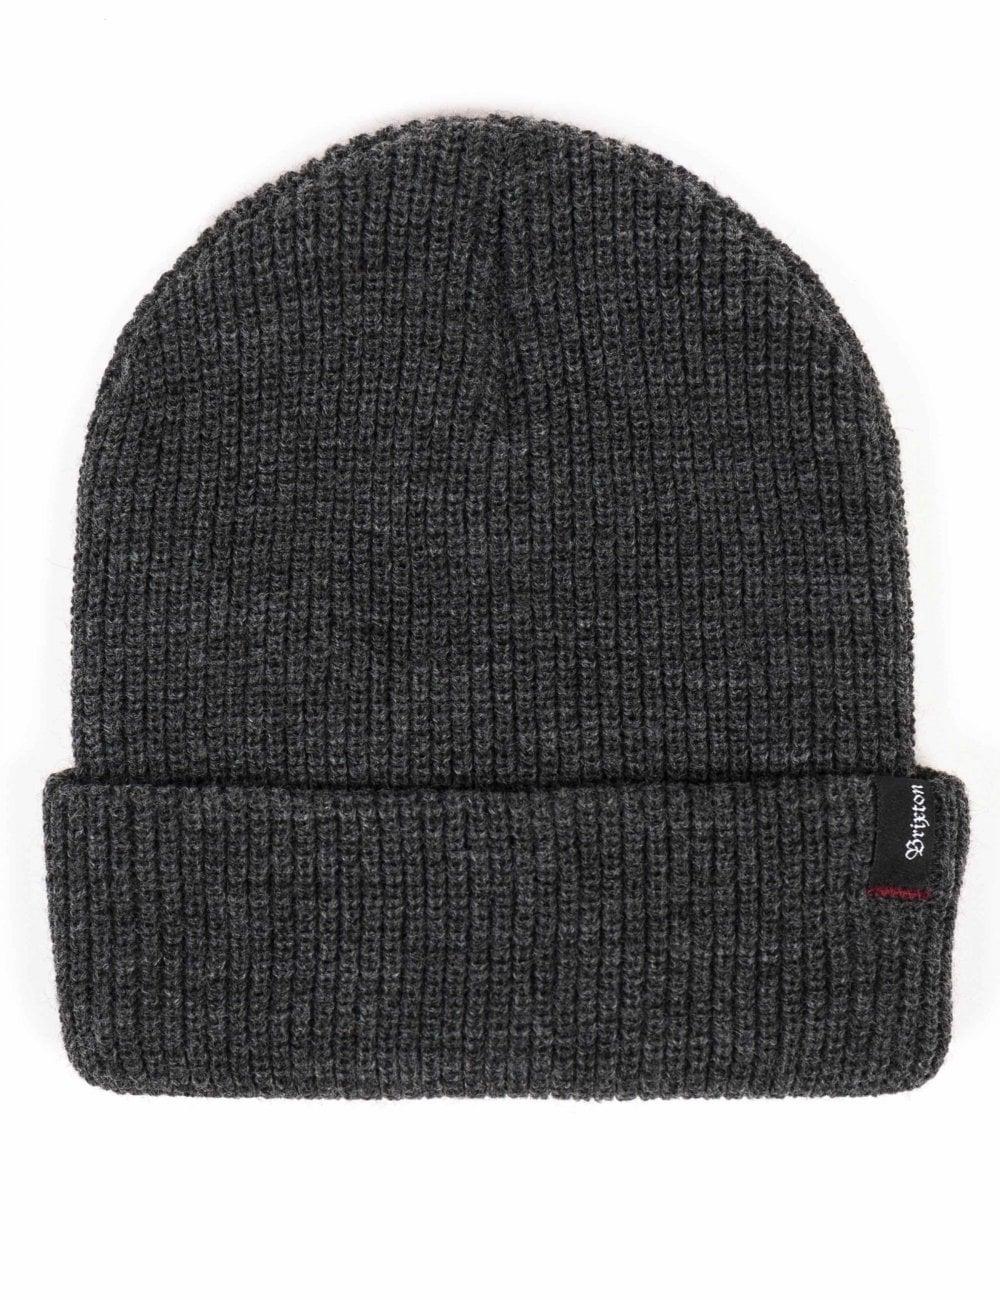 Brixton Heist Beanie Hat - Heather Grey - Accessories from Fat ... 33ce0f5d5f08